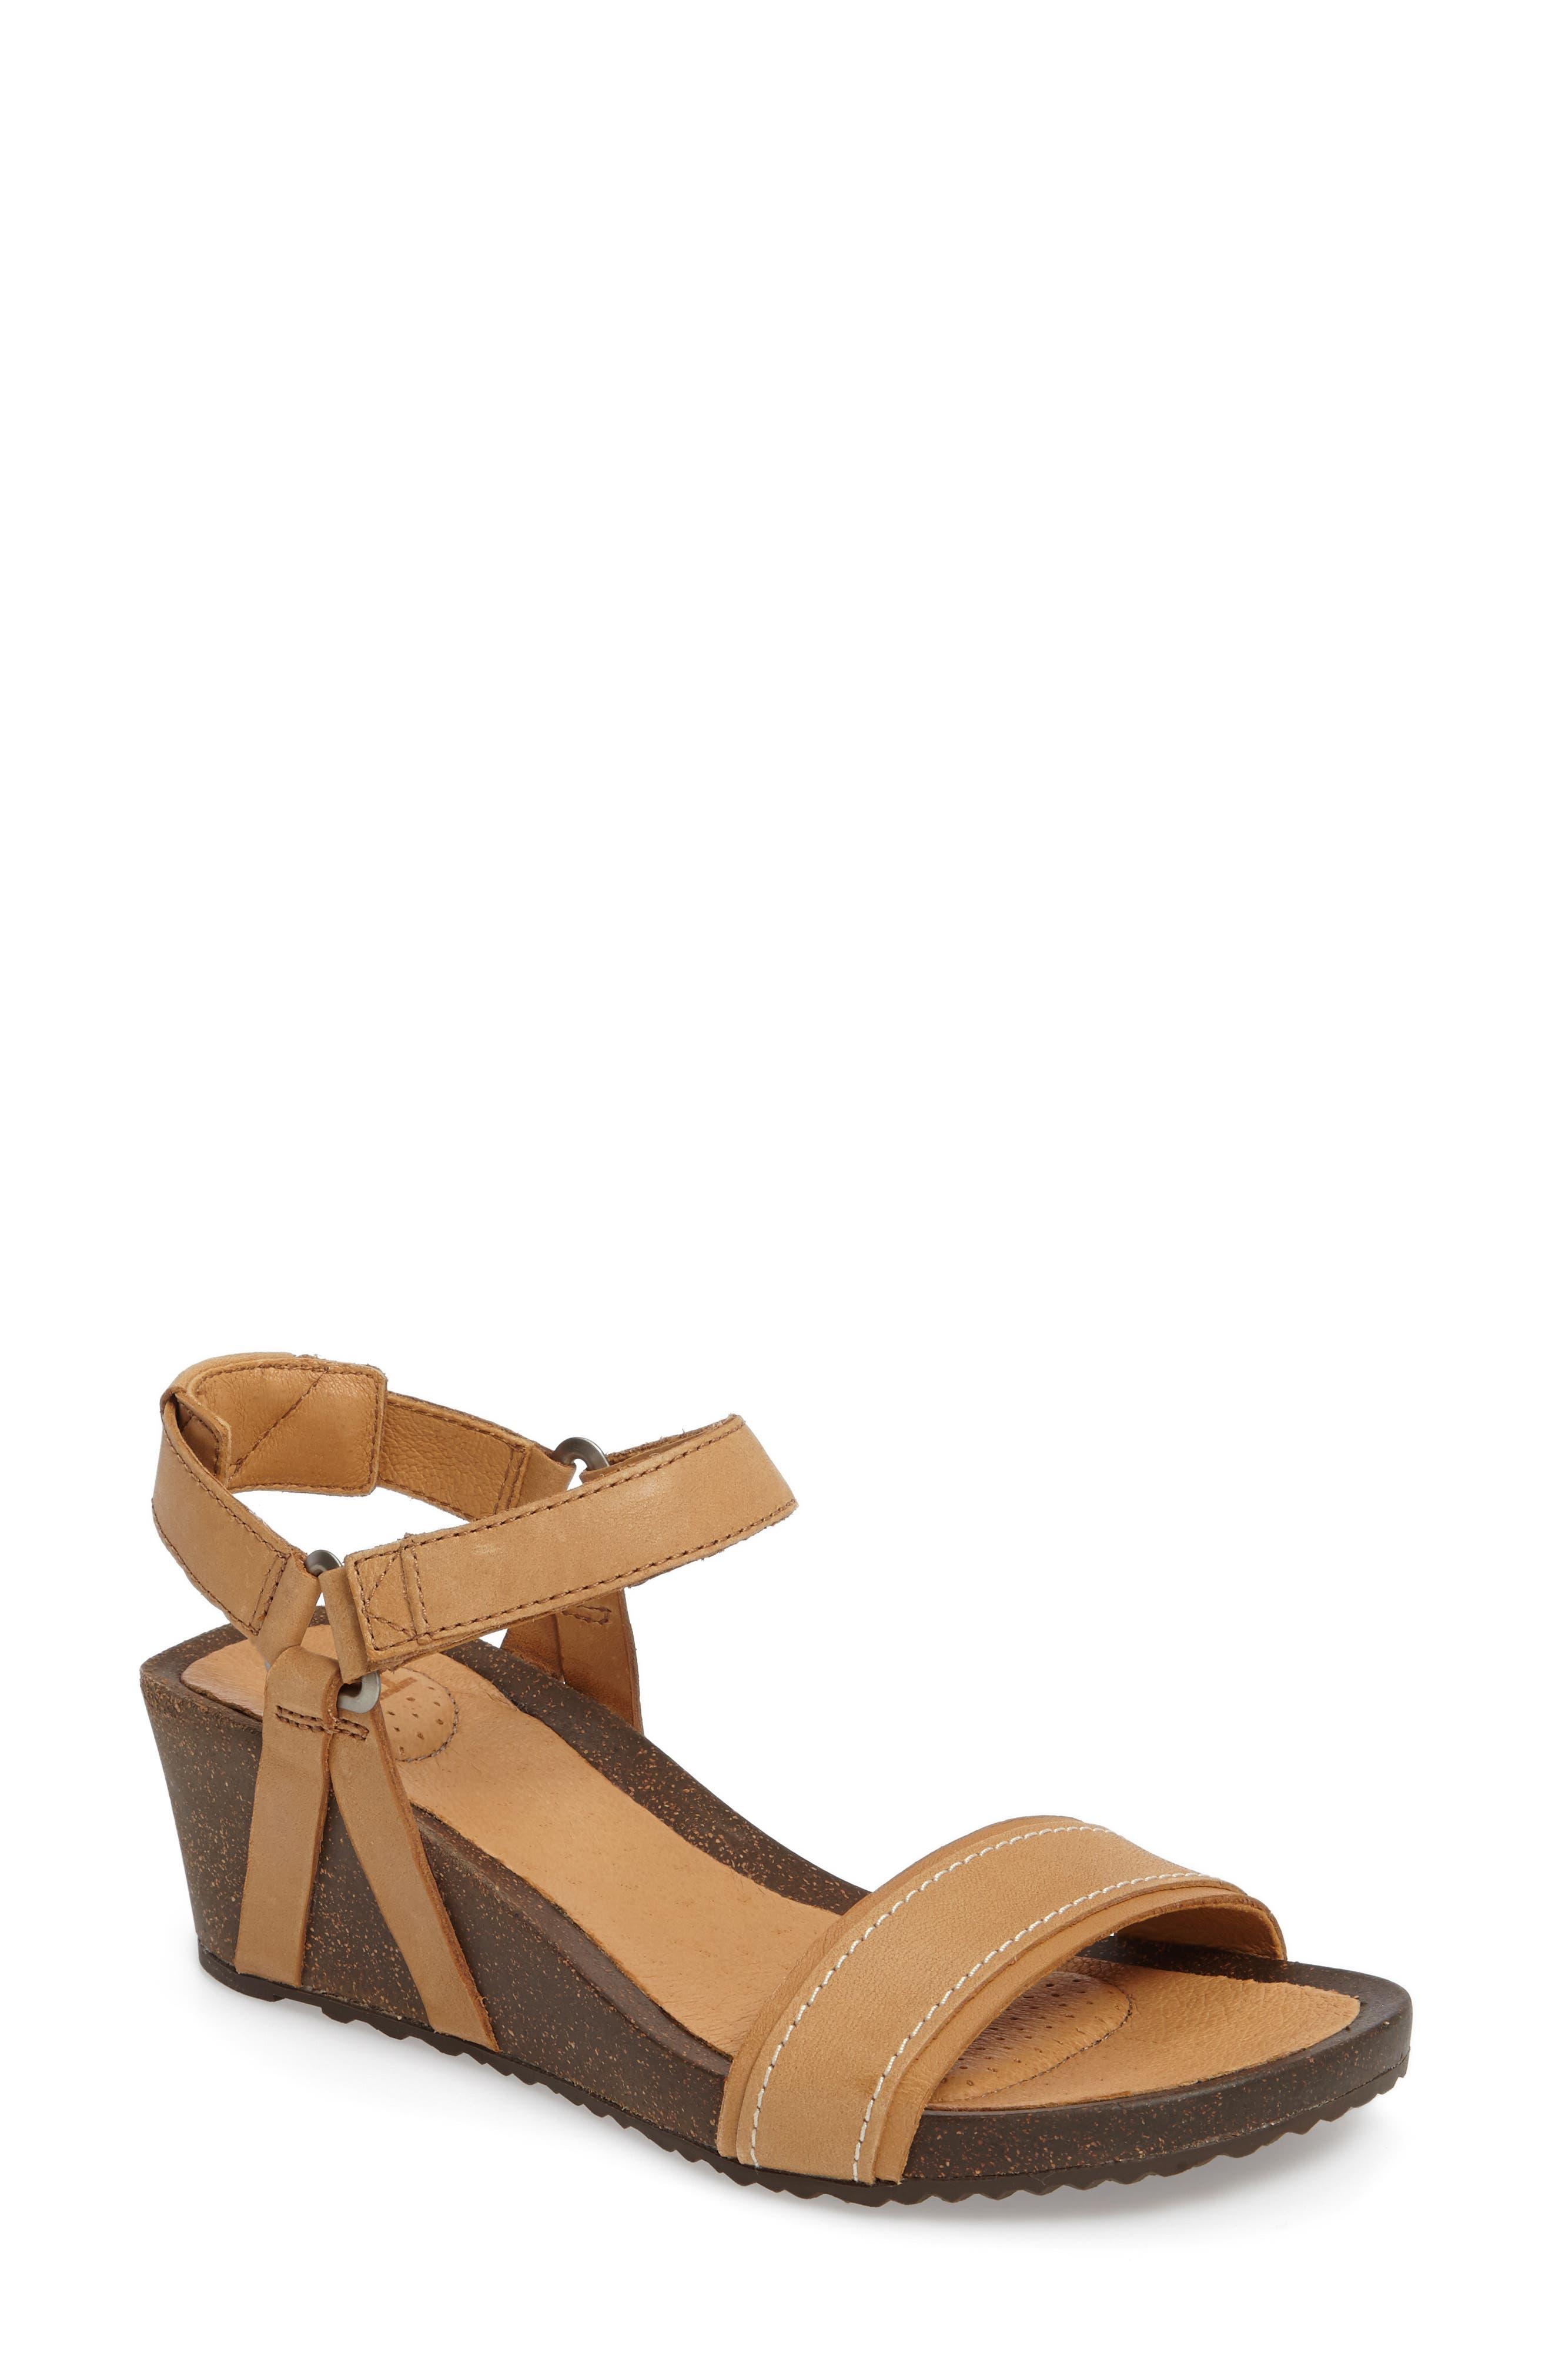 Alternate Image 1 Selected - Tevo Ysidro Stitch Wedge Sandal (Women)